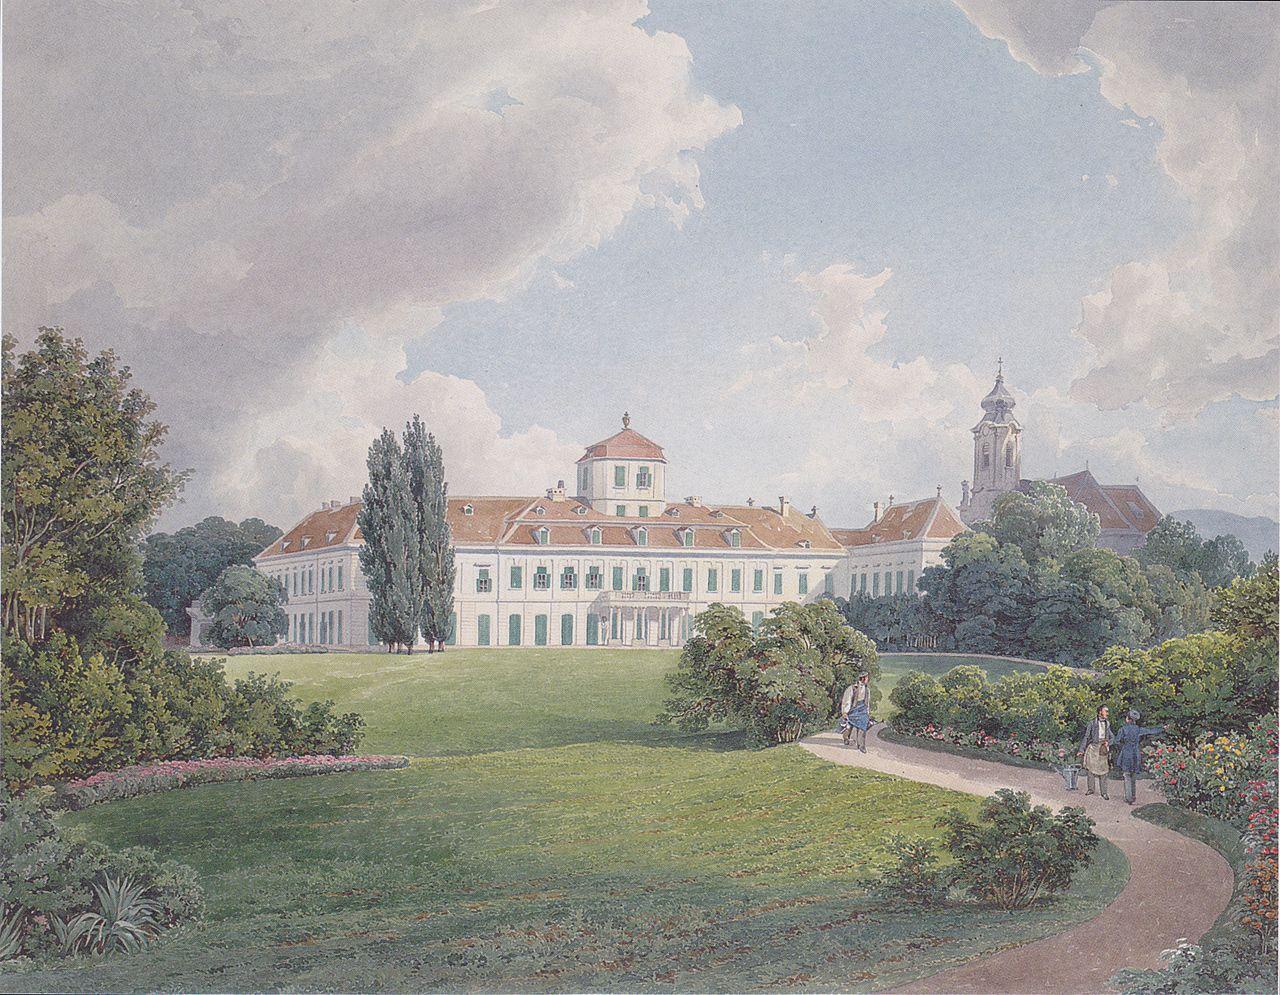 1280px-Eduard_Gurk_-_Der_Blaue_Hof_in_Laxenburg_bei_Wien_-_ca_1838.jpeg